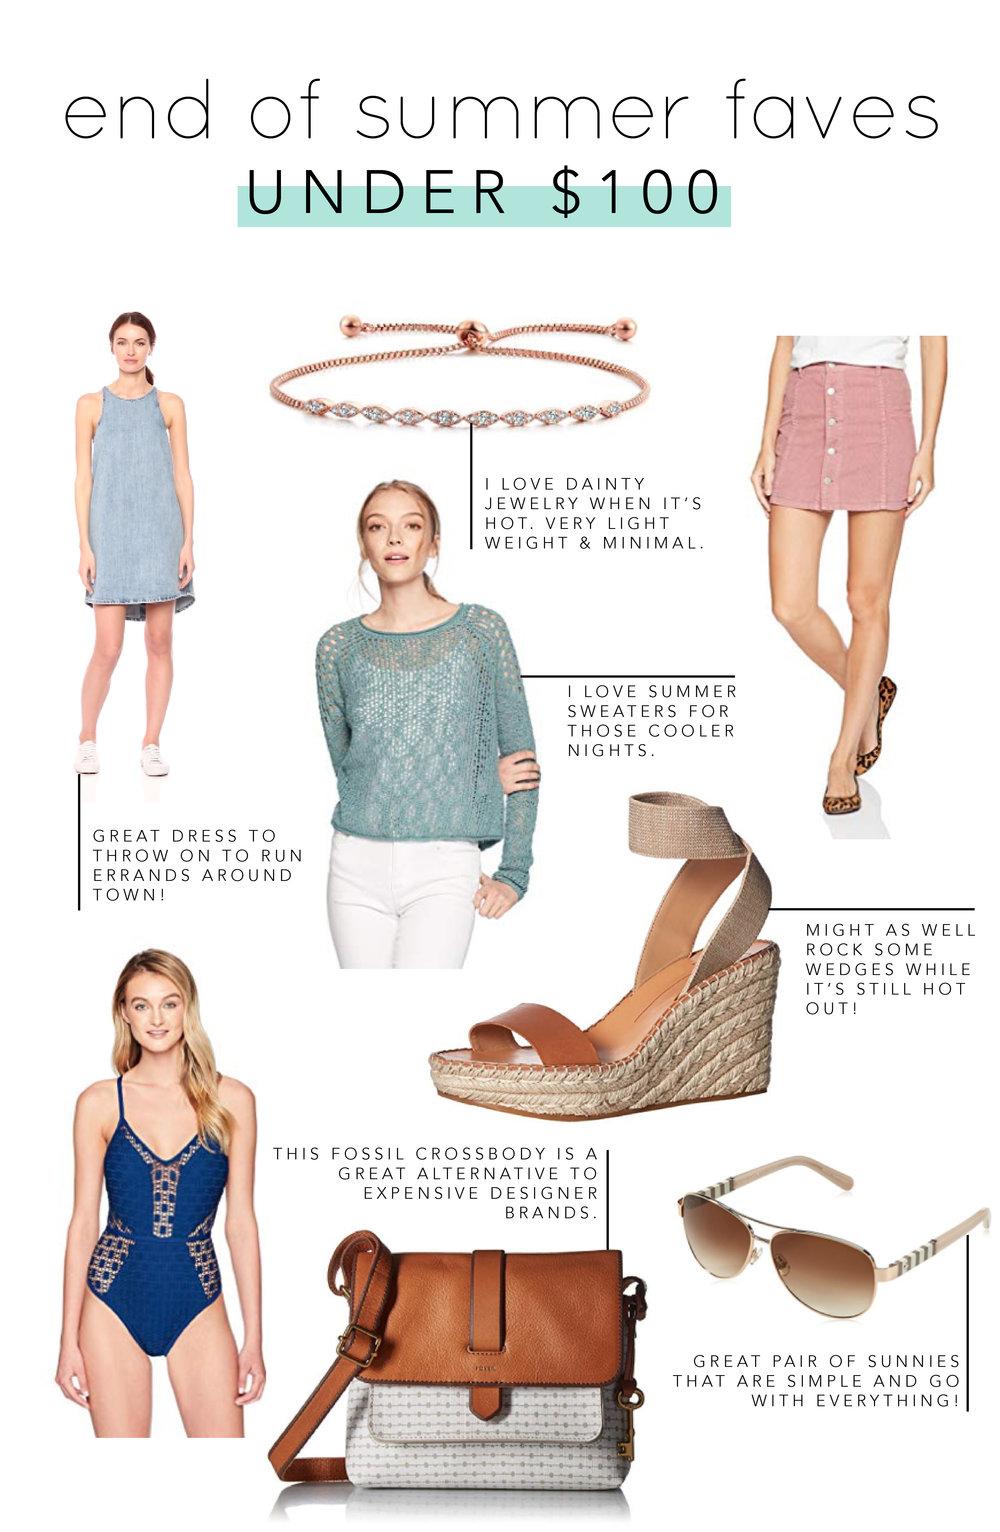 Denim Dress  |  Dainty Bracelet  |  Pink Button Skirt  |  Summer Sweater  |  Wedges  |  Lace Swim Suit  |  Cross Body Bag  |  Aviator Sunglasses